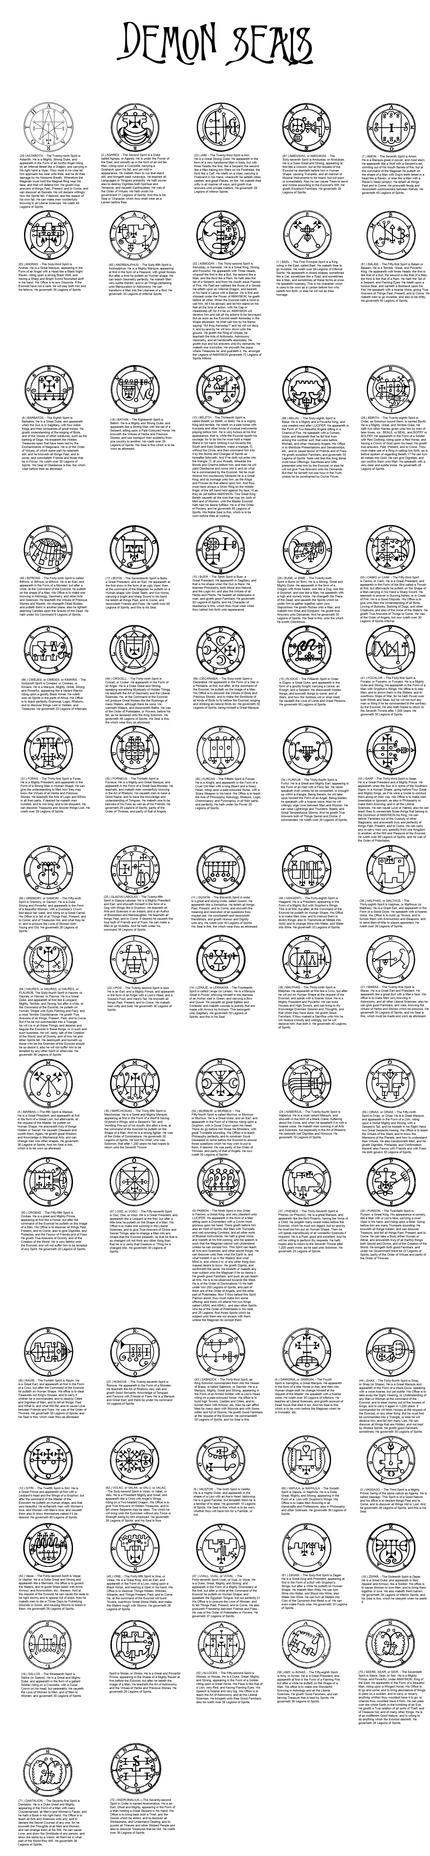 Demon Seals by zero0810